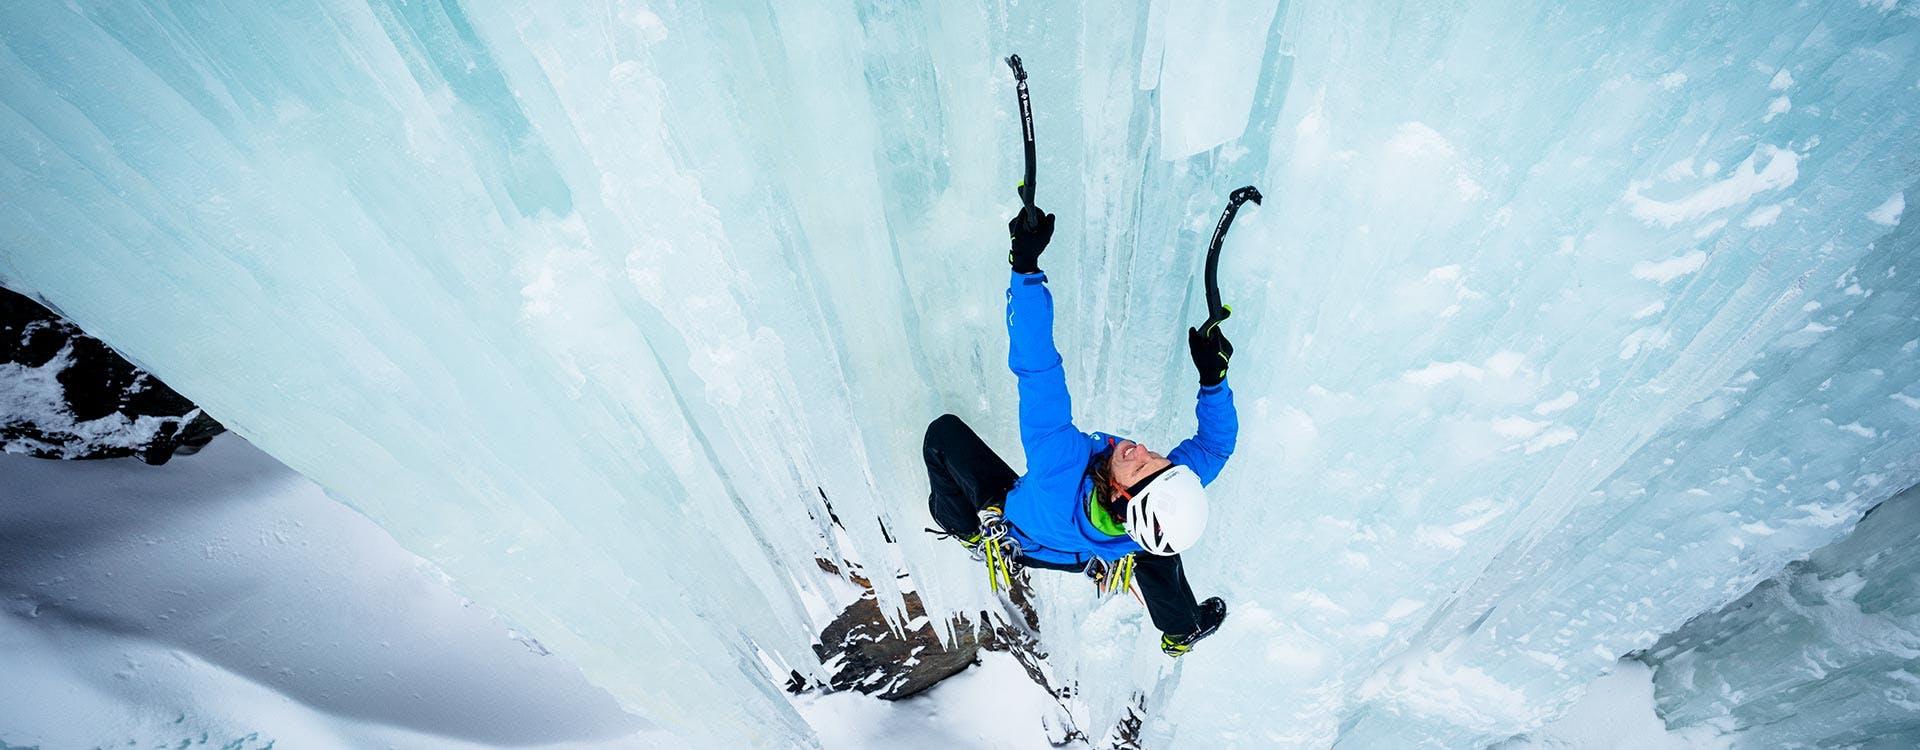 Man climbing an ice route